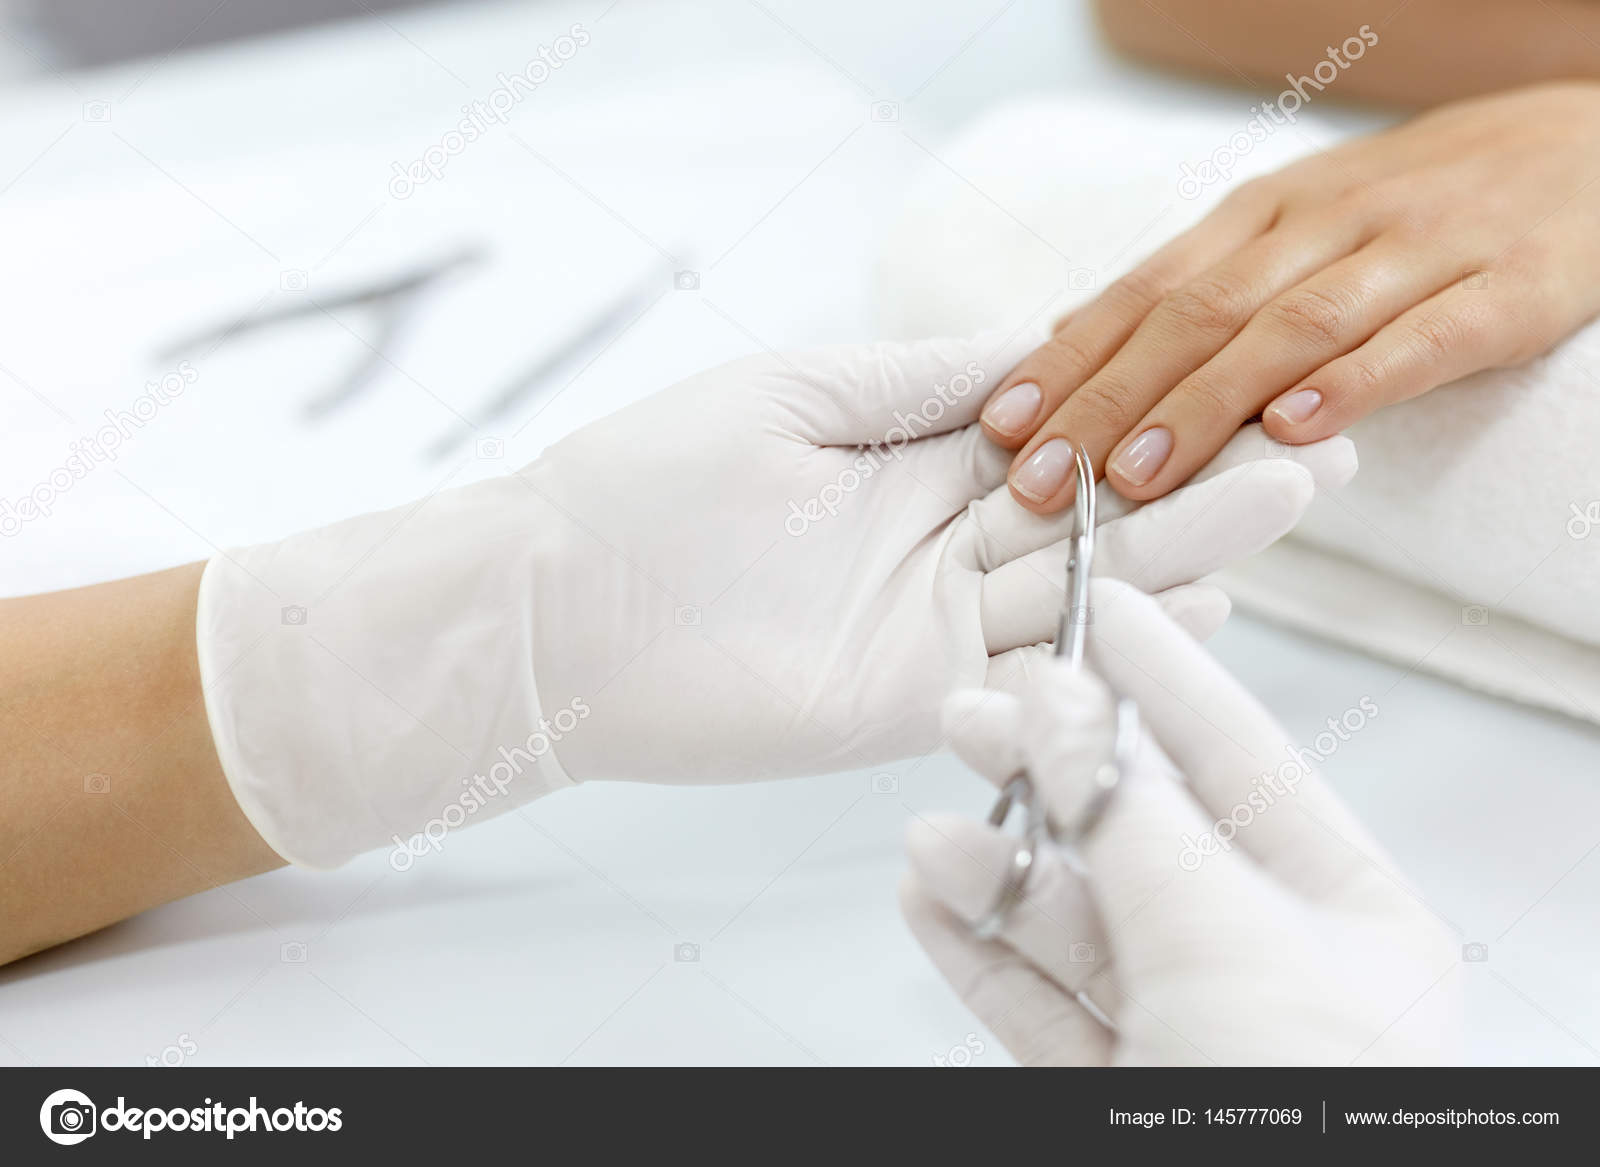 Nail Care. Female Hands Cutting Cuticles With Scissors. Manicure ...